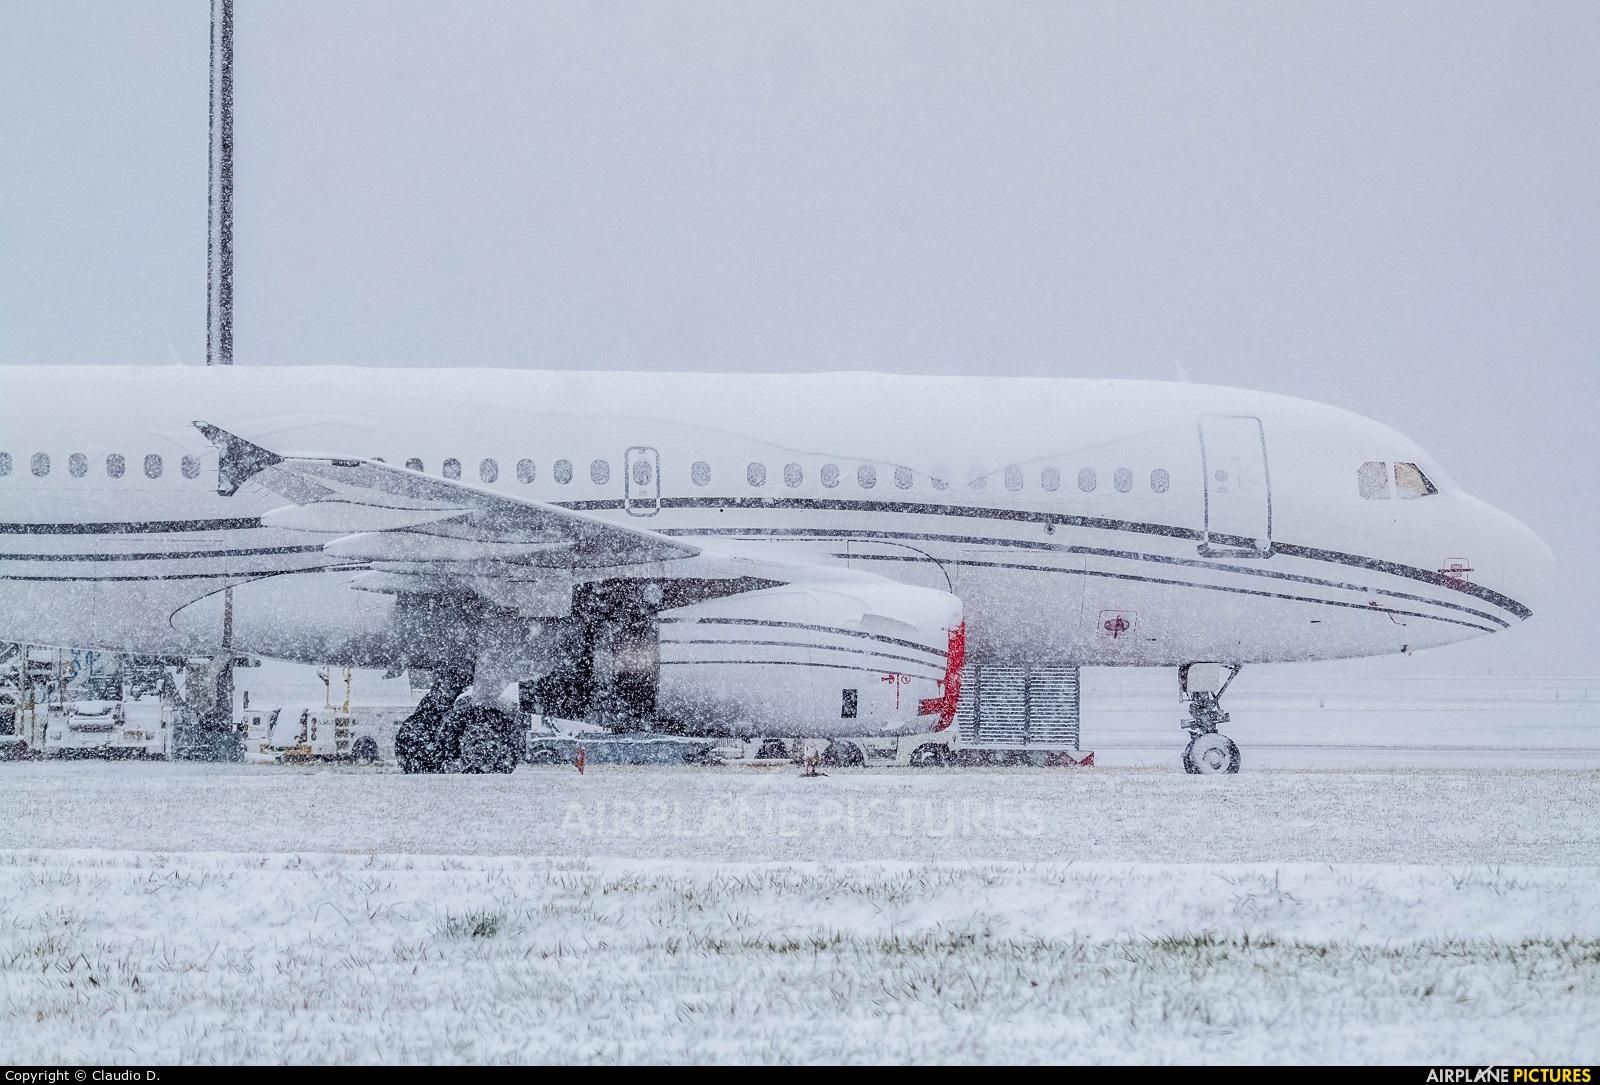 VipJet VQ-BVQ aircraft at Zurich